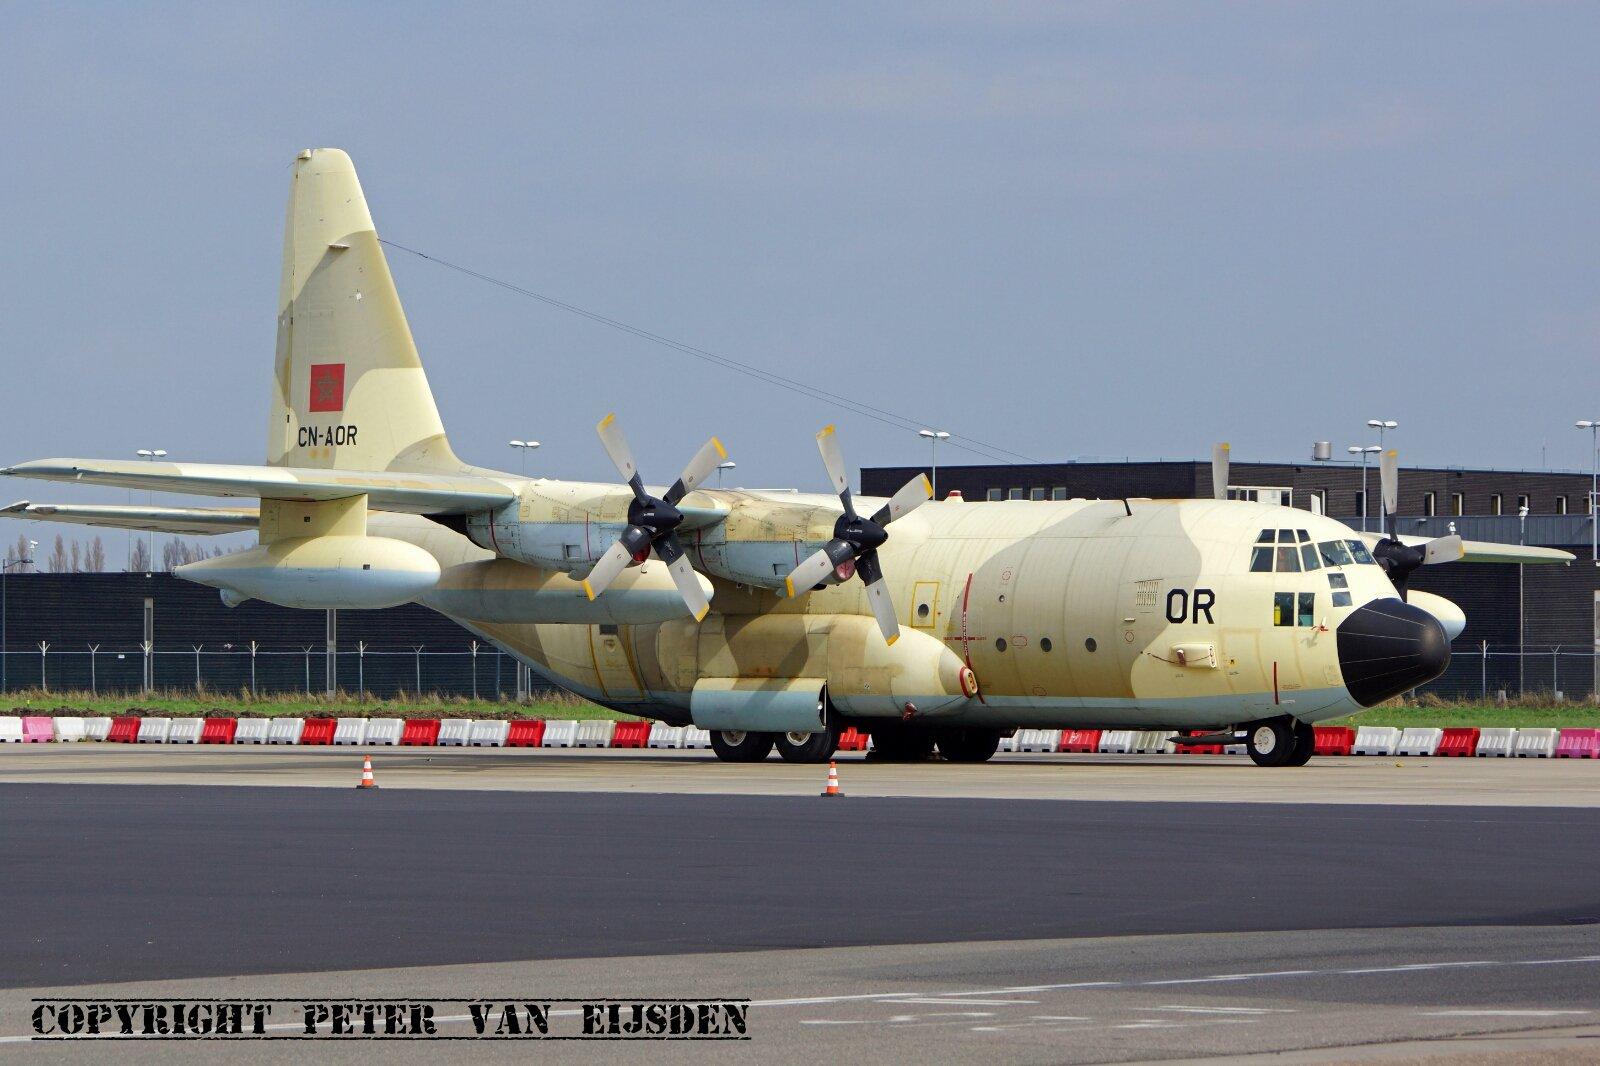 FRA: Photos d'avions de transport - Page 27 26054201705_abebfbf97f_o